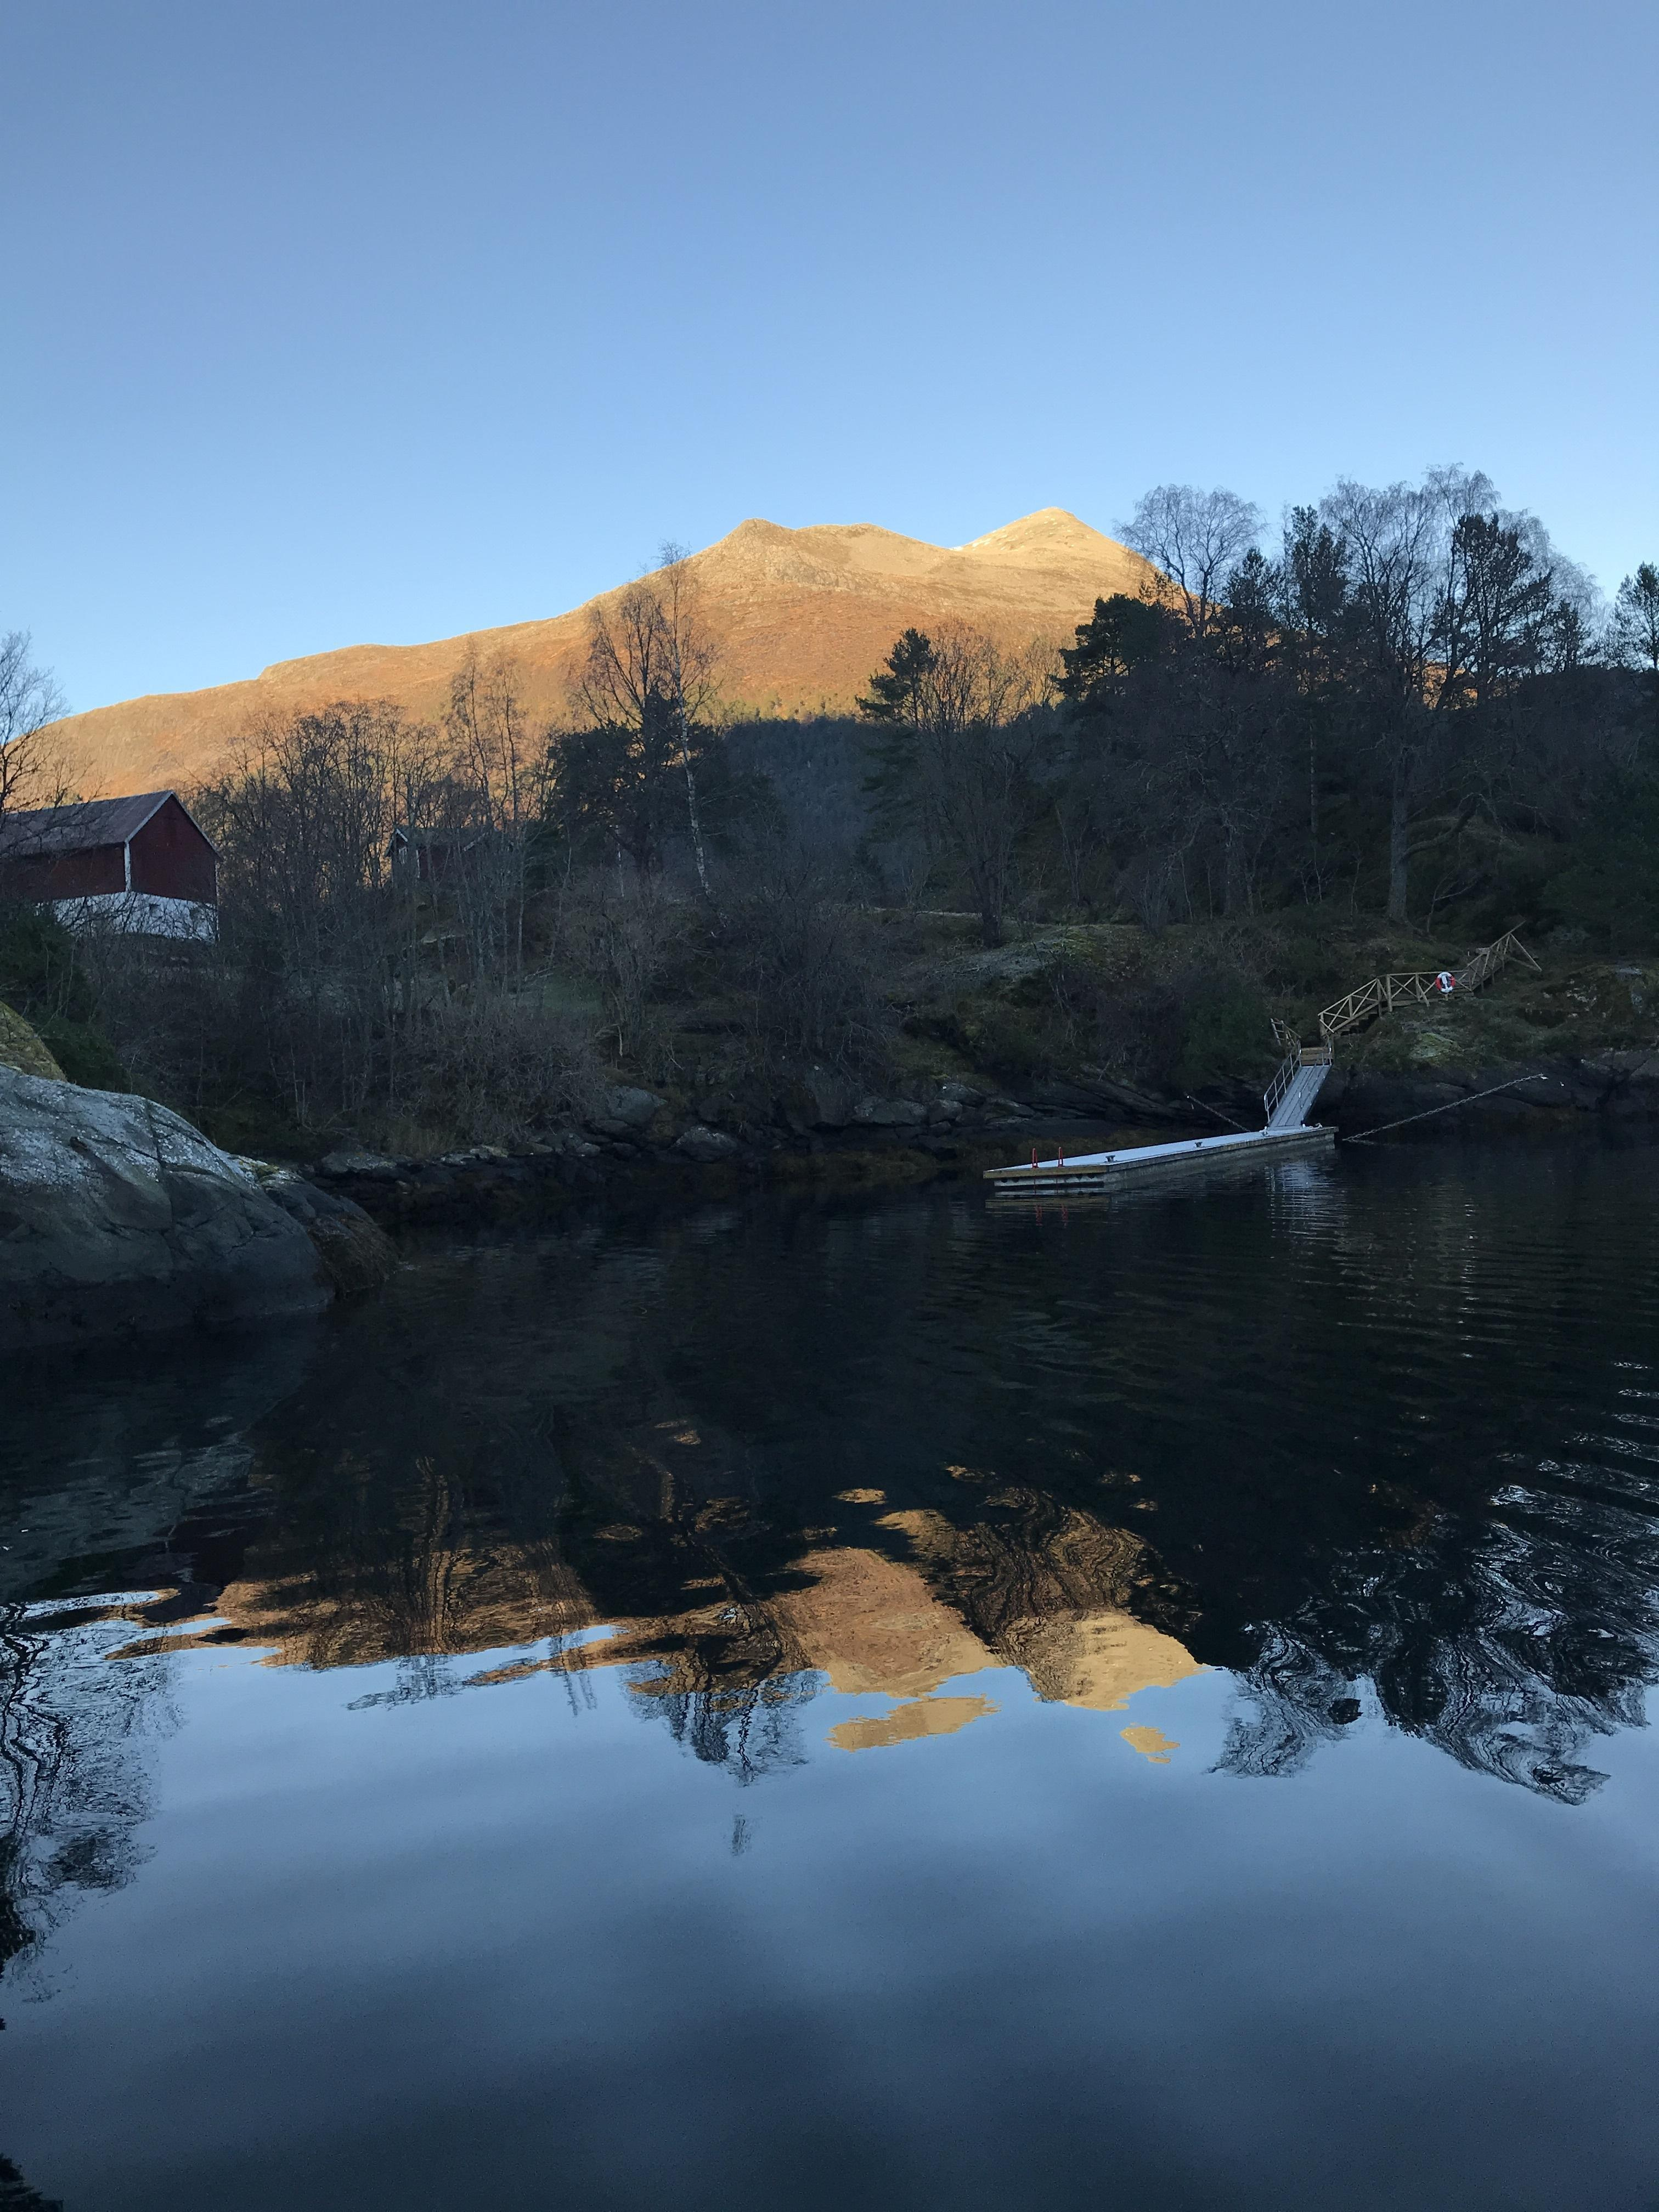 https://www.marinasolutions.no/uploads/Årsetøya-volda-kommune-betongbrygge-redningsleider.JPG